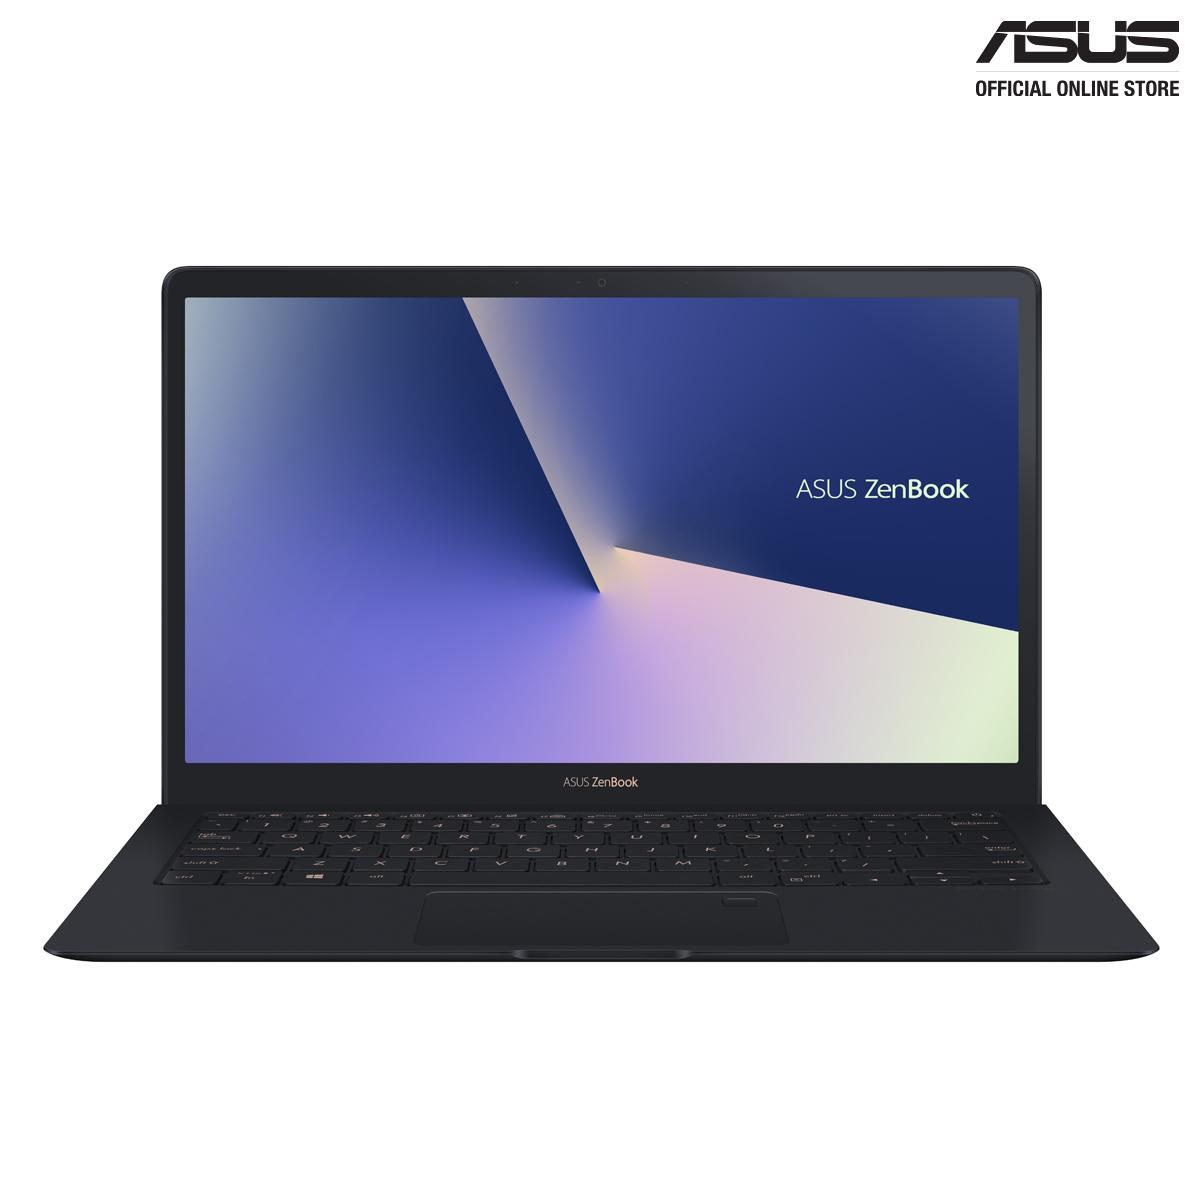 ASUS Zenbook S UX391UA-ET012T (Deep Dive Blue)